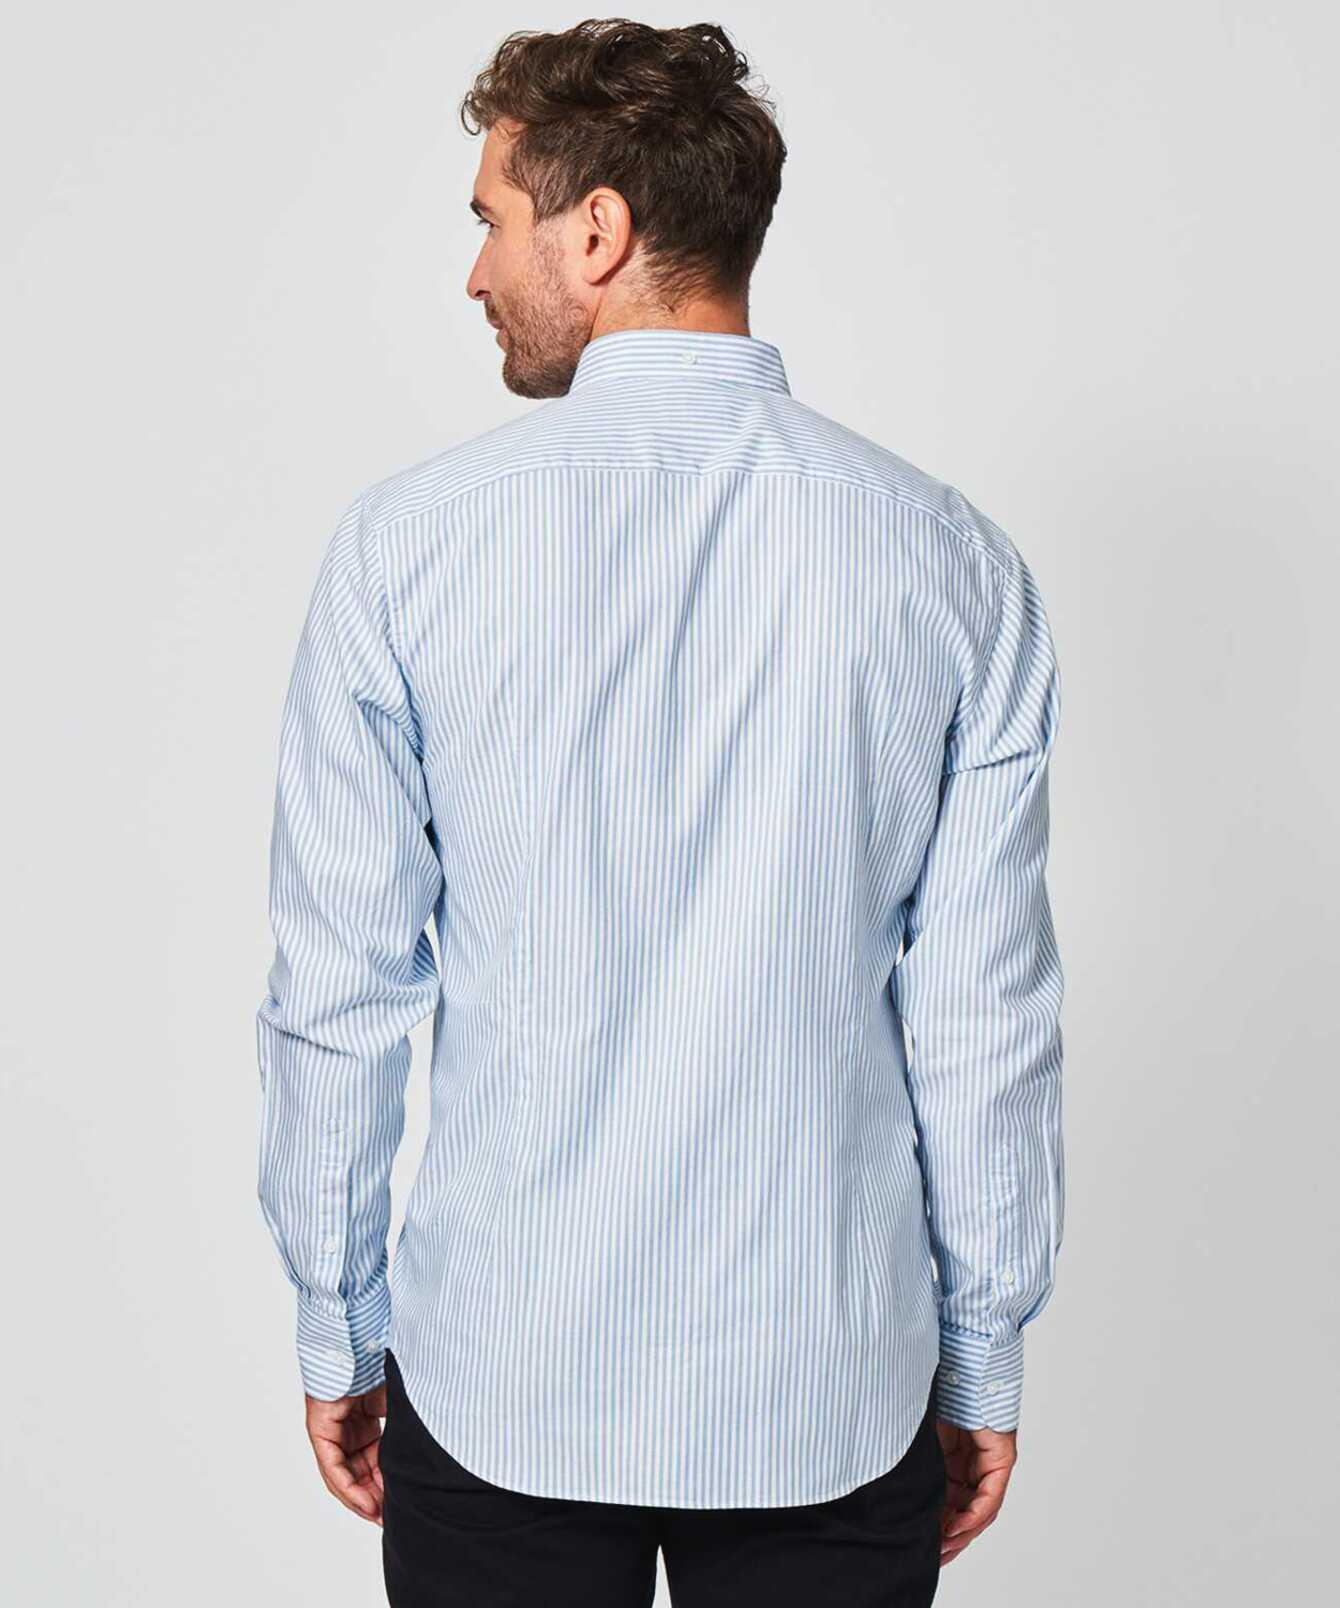 Skjorta Oxford Stripe Blå The Shirt Factory